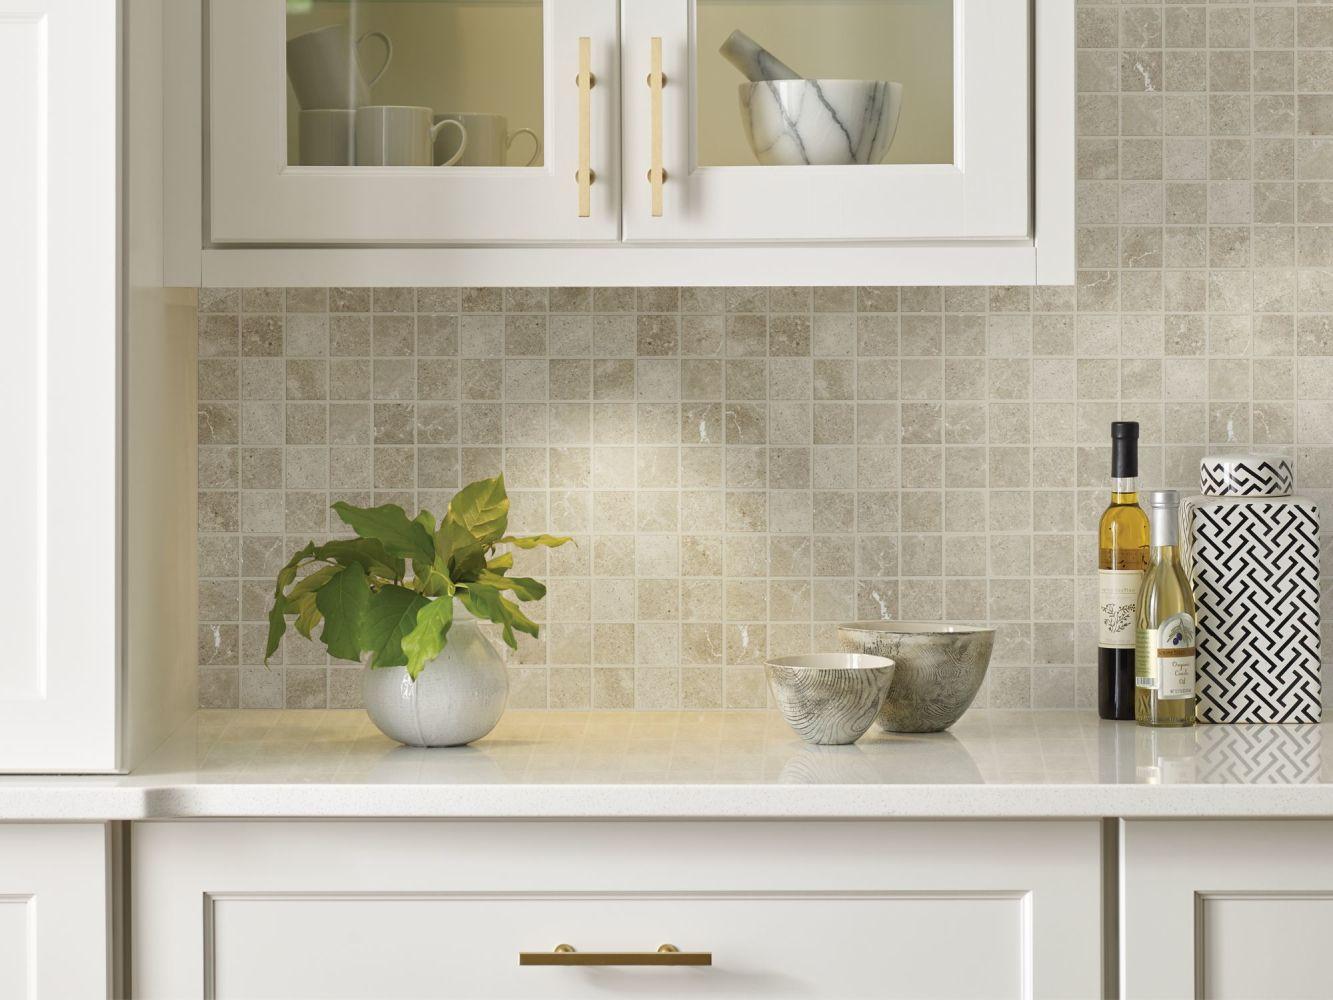 Shaw Floors Home Fn Gold Ceramic Serenity Mosaic Light Grey 00500_TGJ92